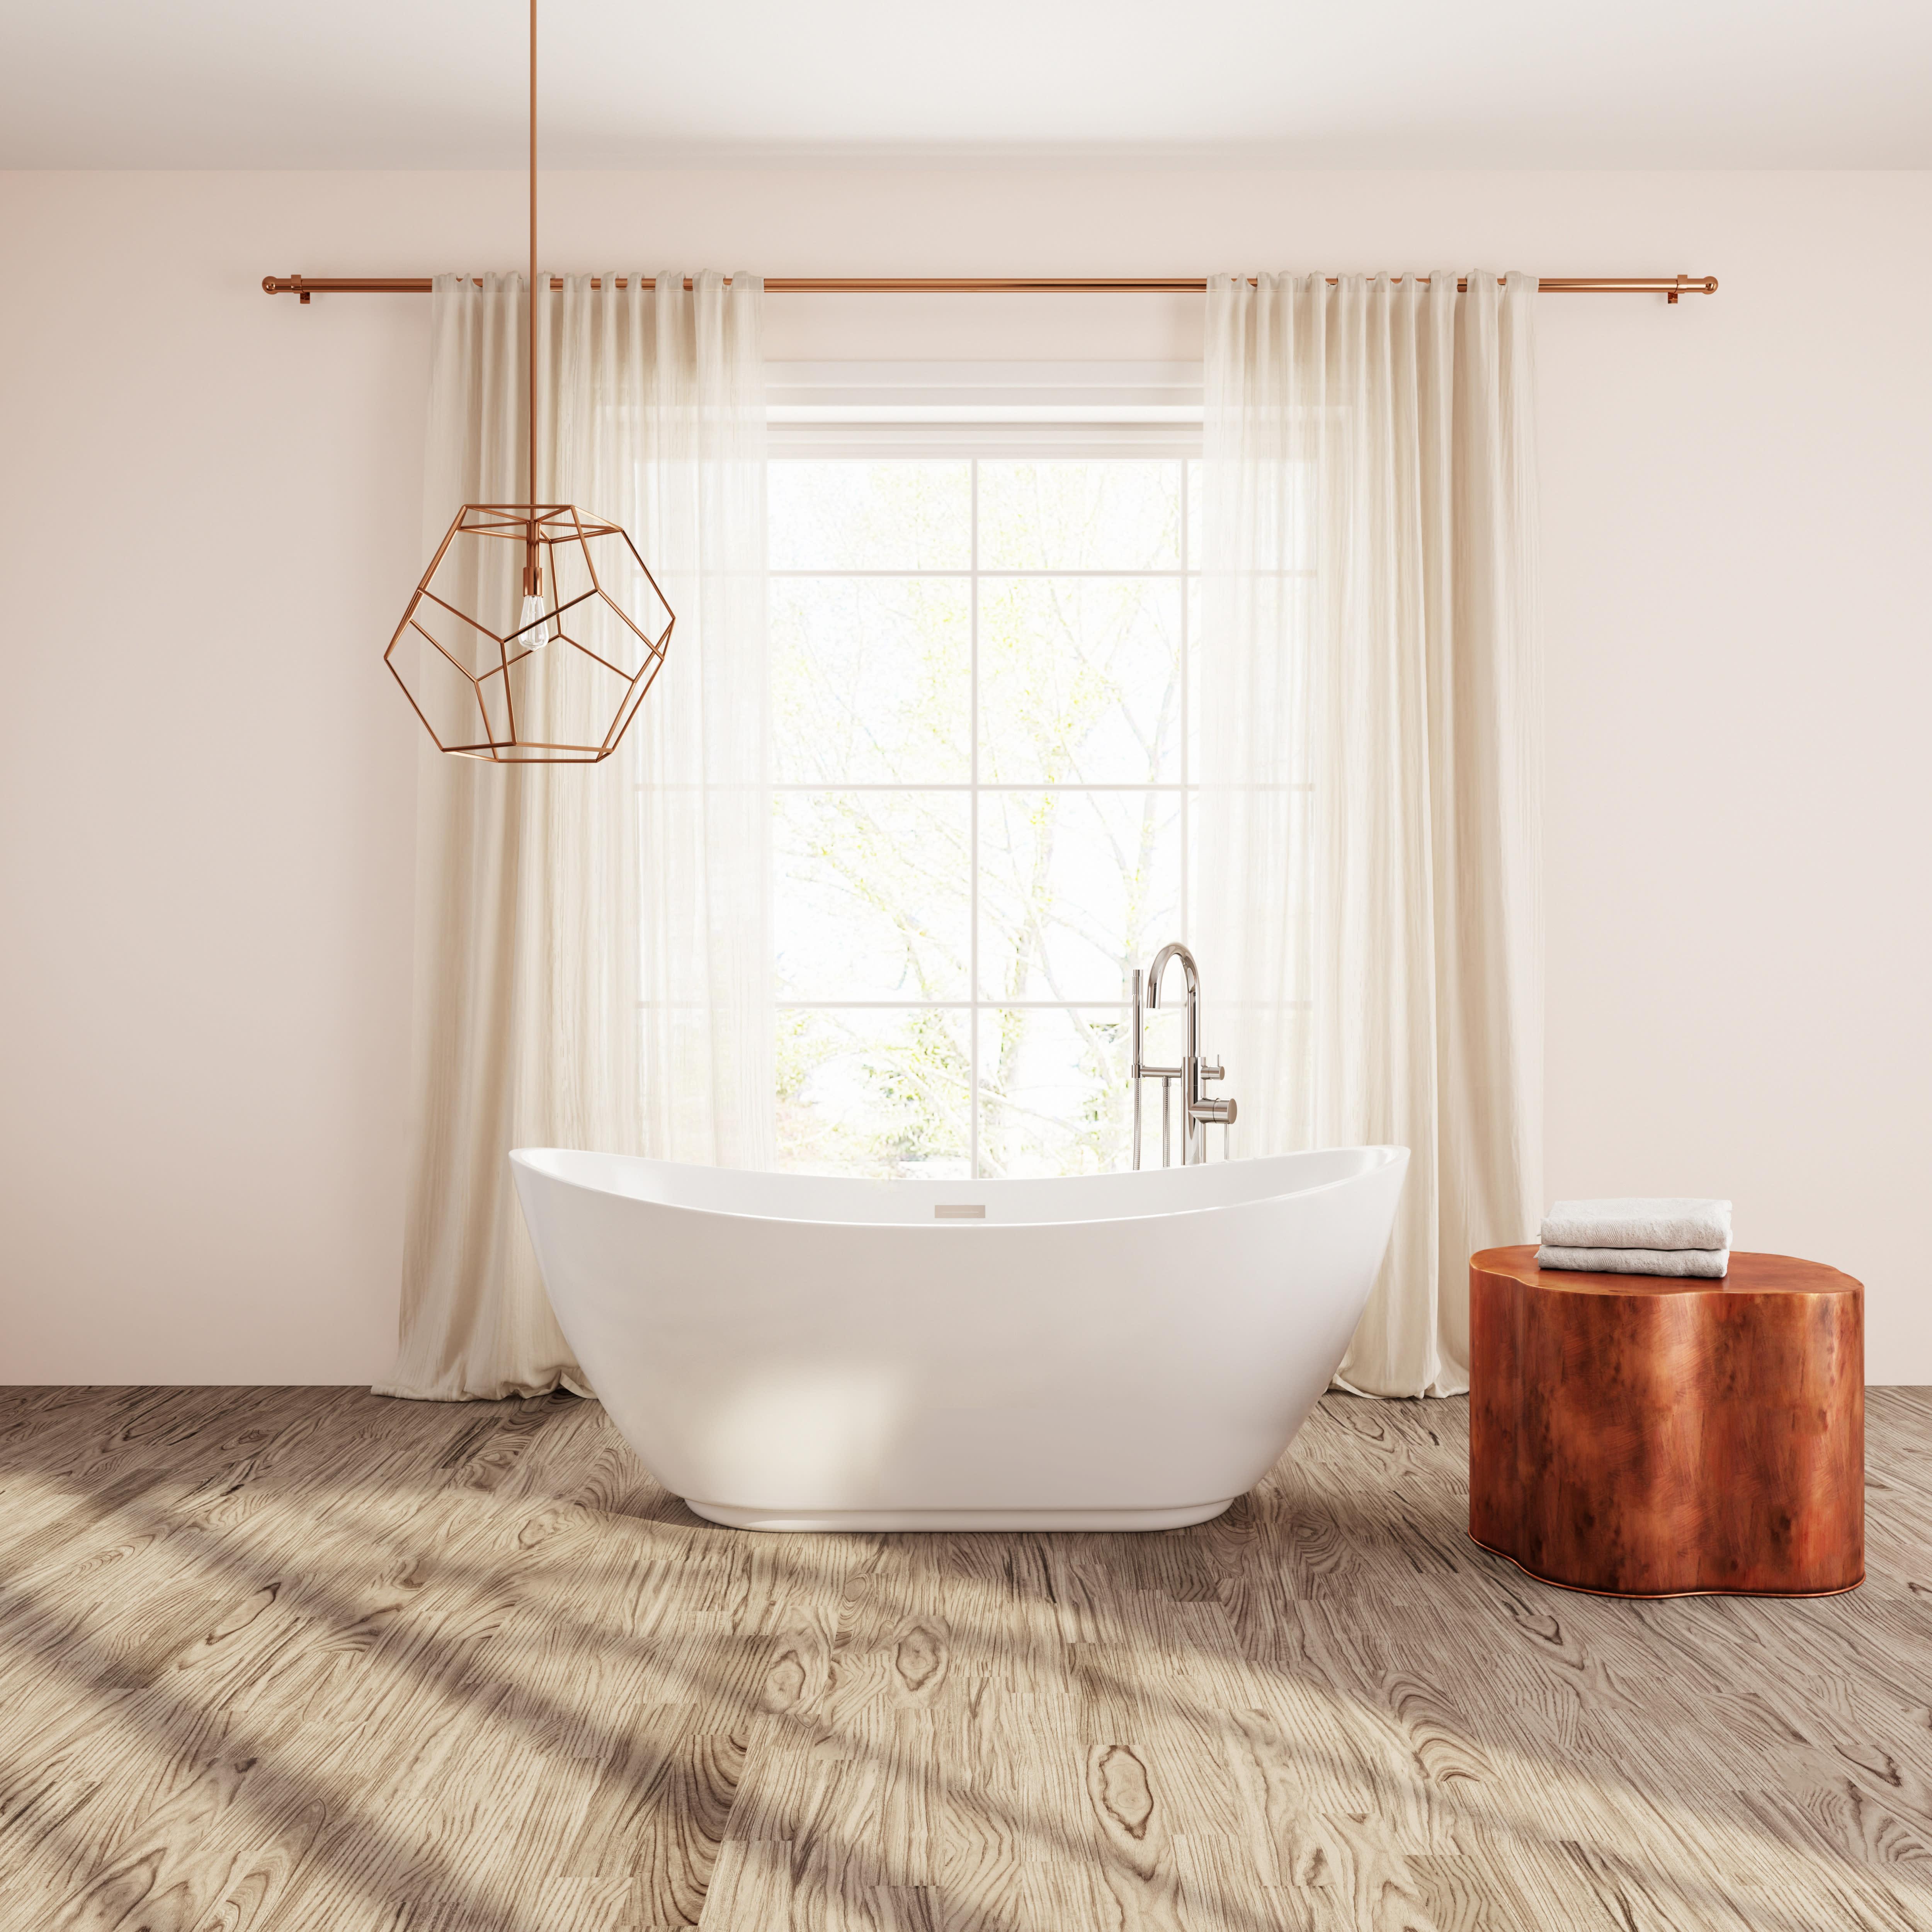 7 diy practical and decorative bathroom ideas.htm perlato ptrma6728 gw roma freestanding soaker tub qualitybath com  gw roma freestanding soaker tub